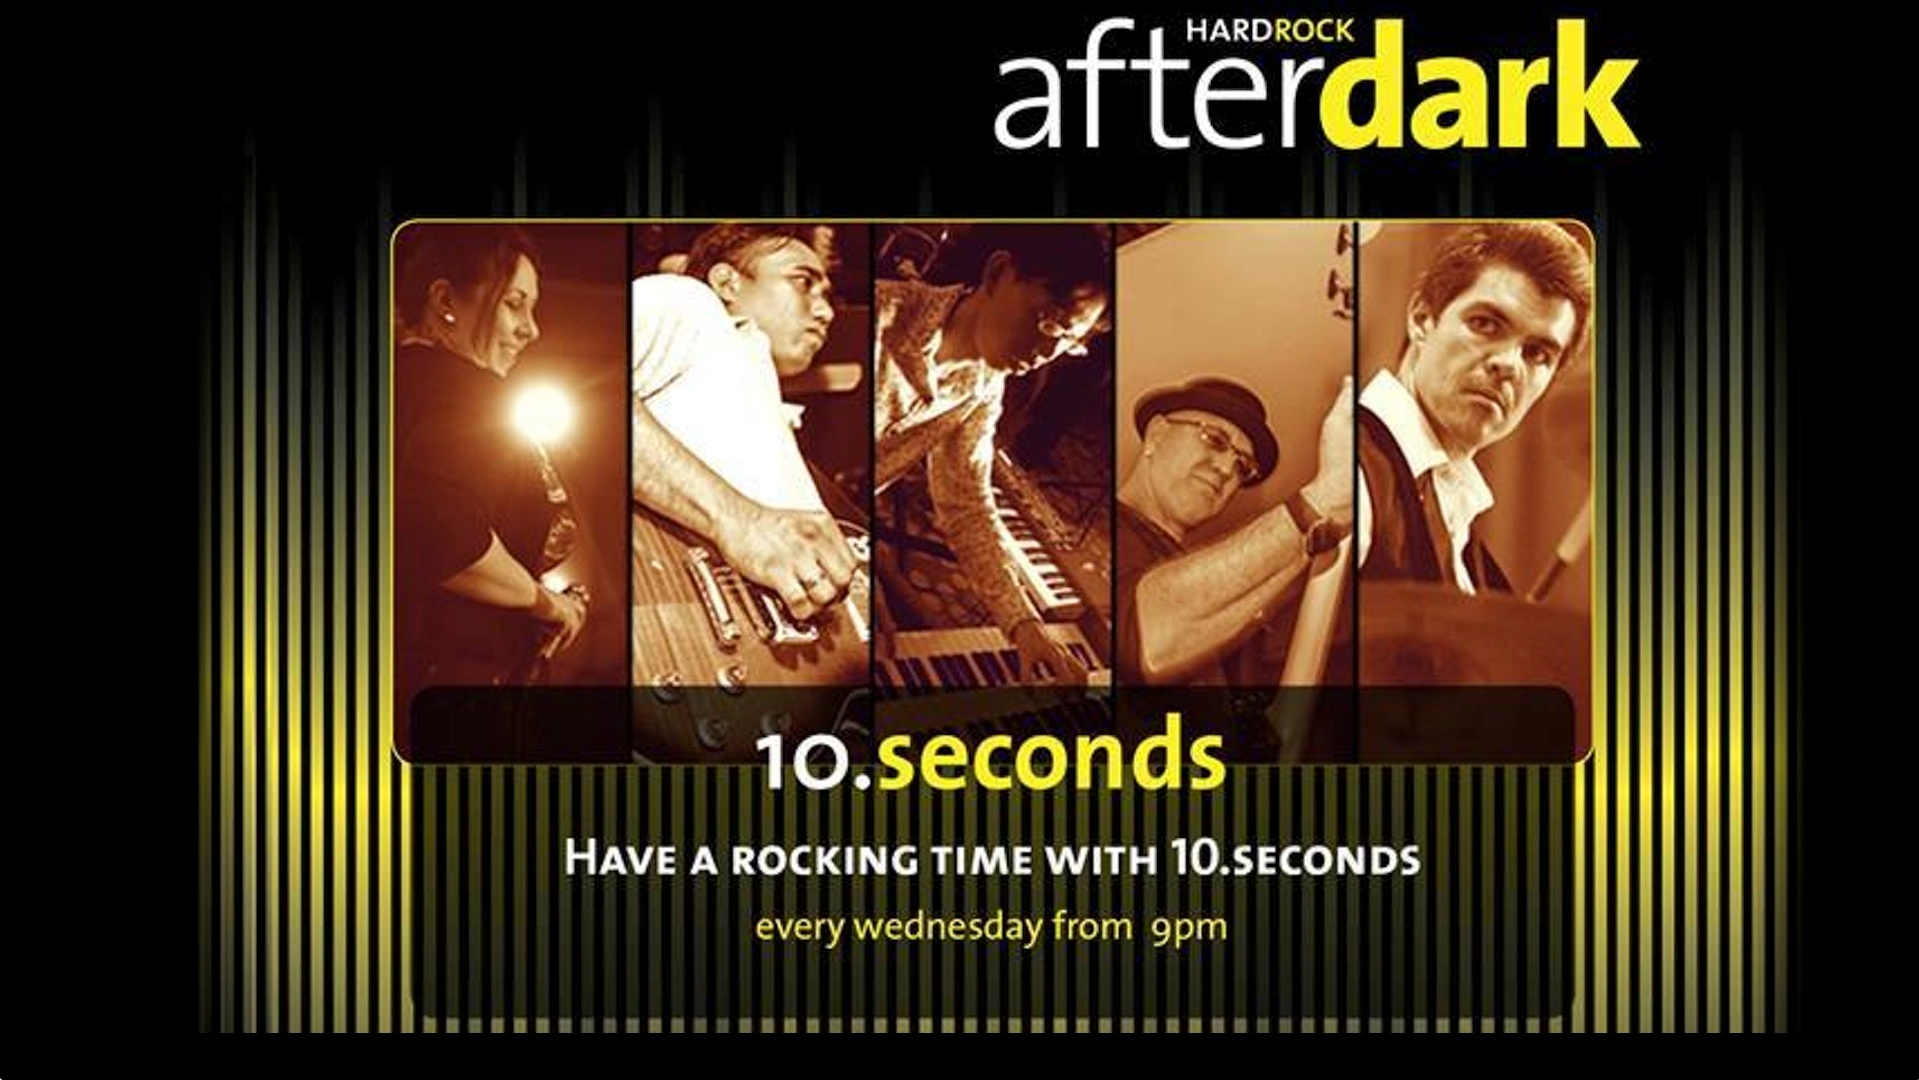 10.seconds